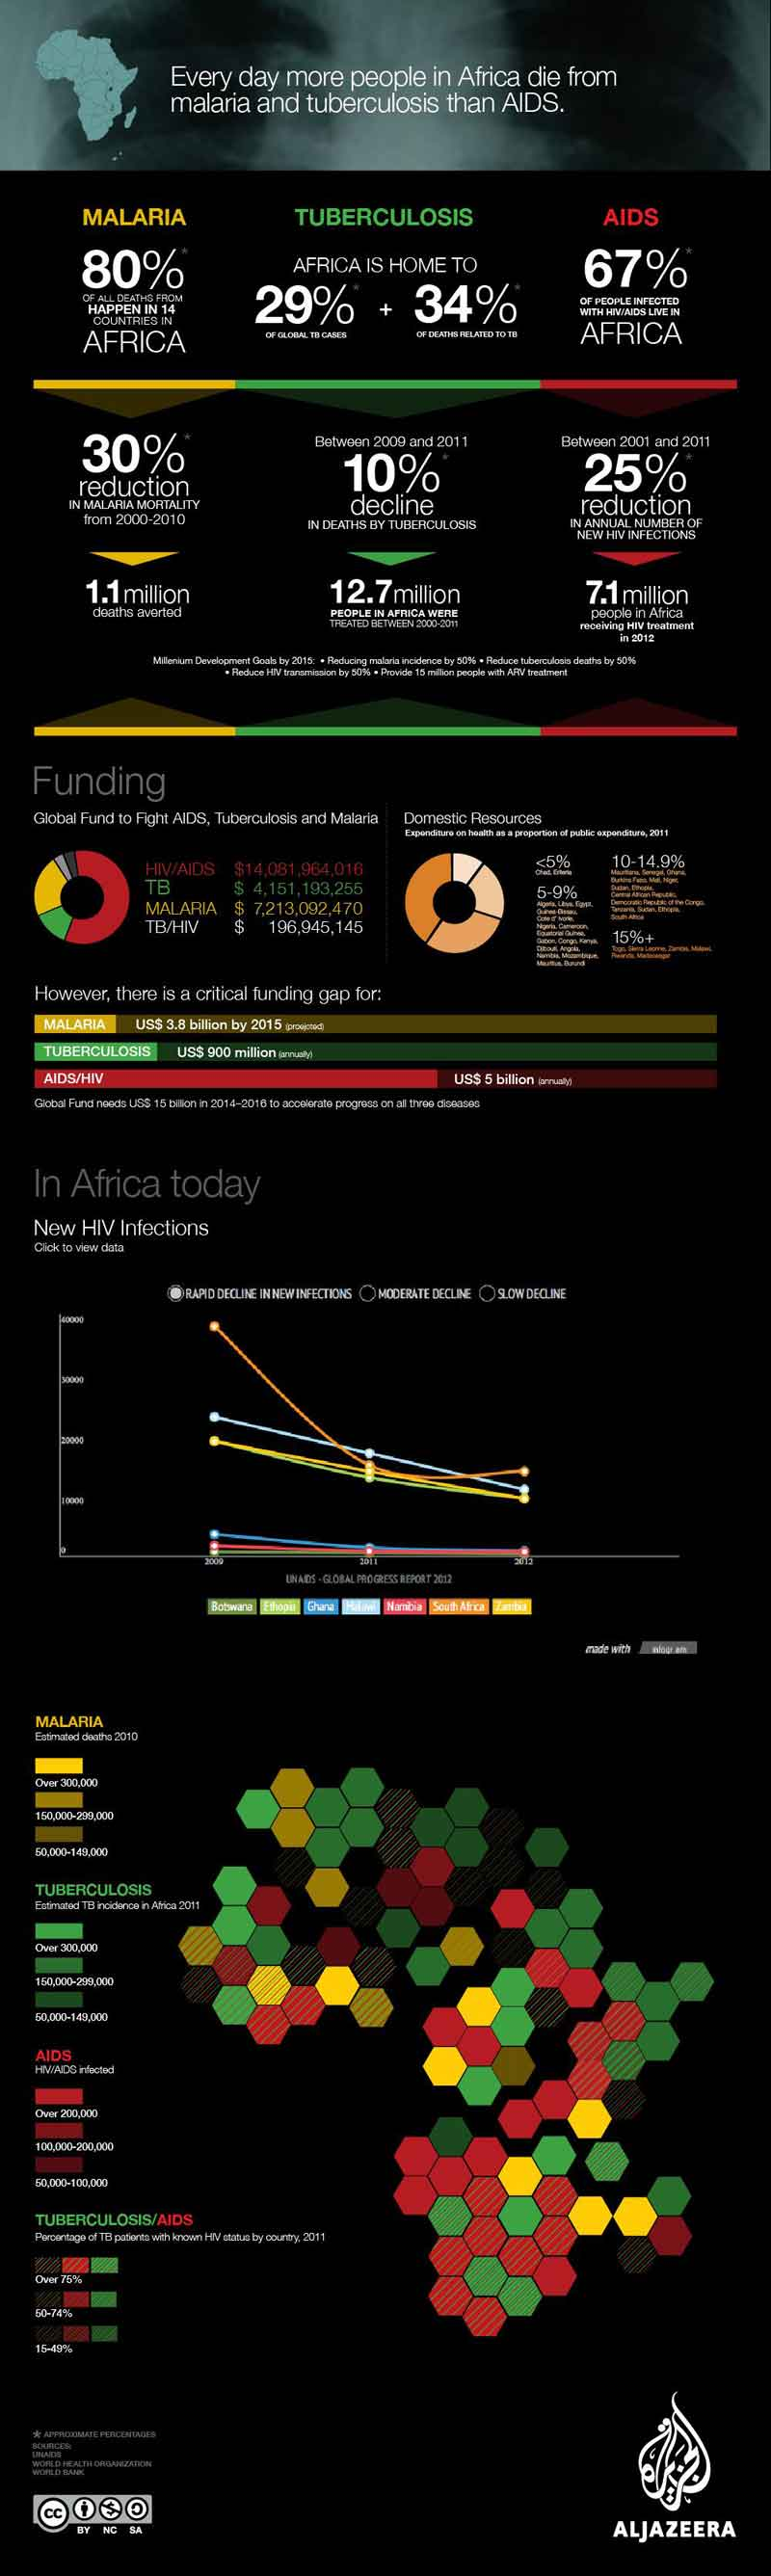 malaria-infographic